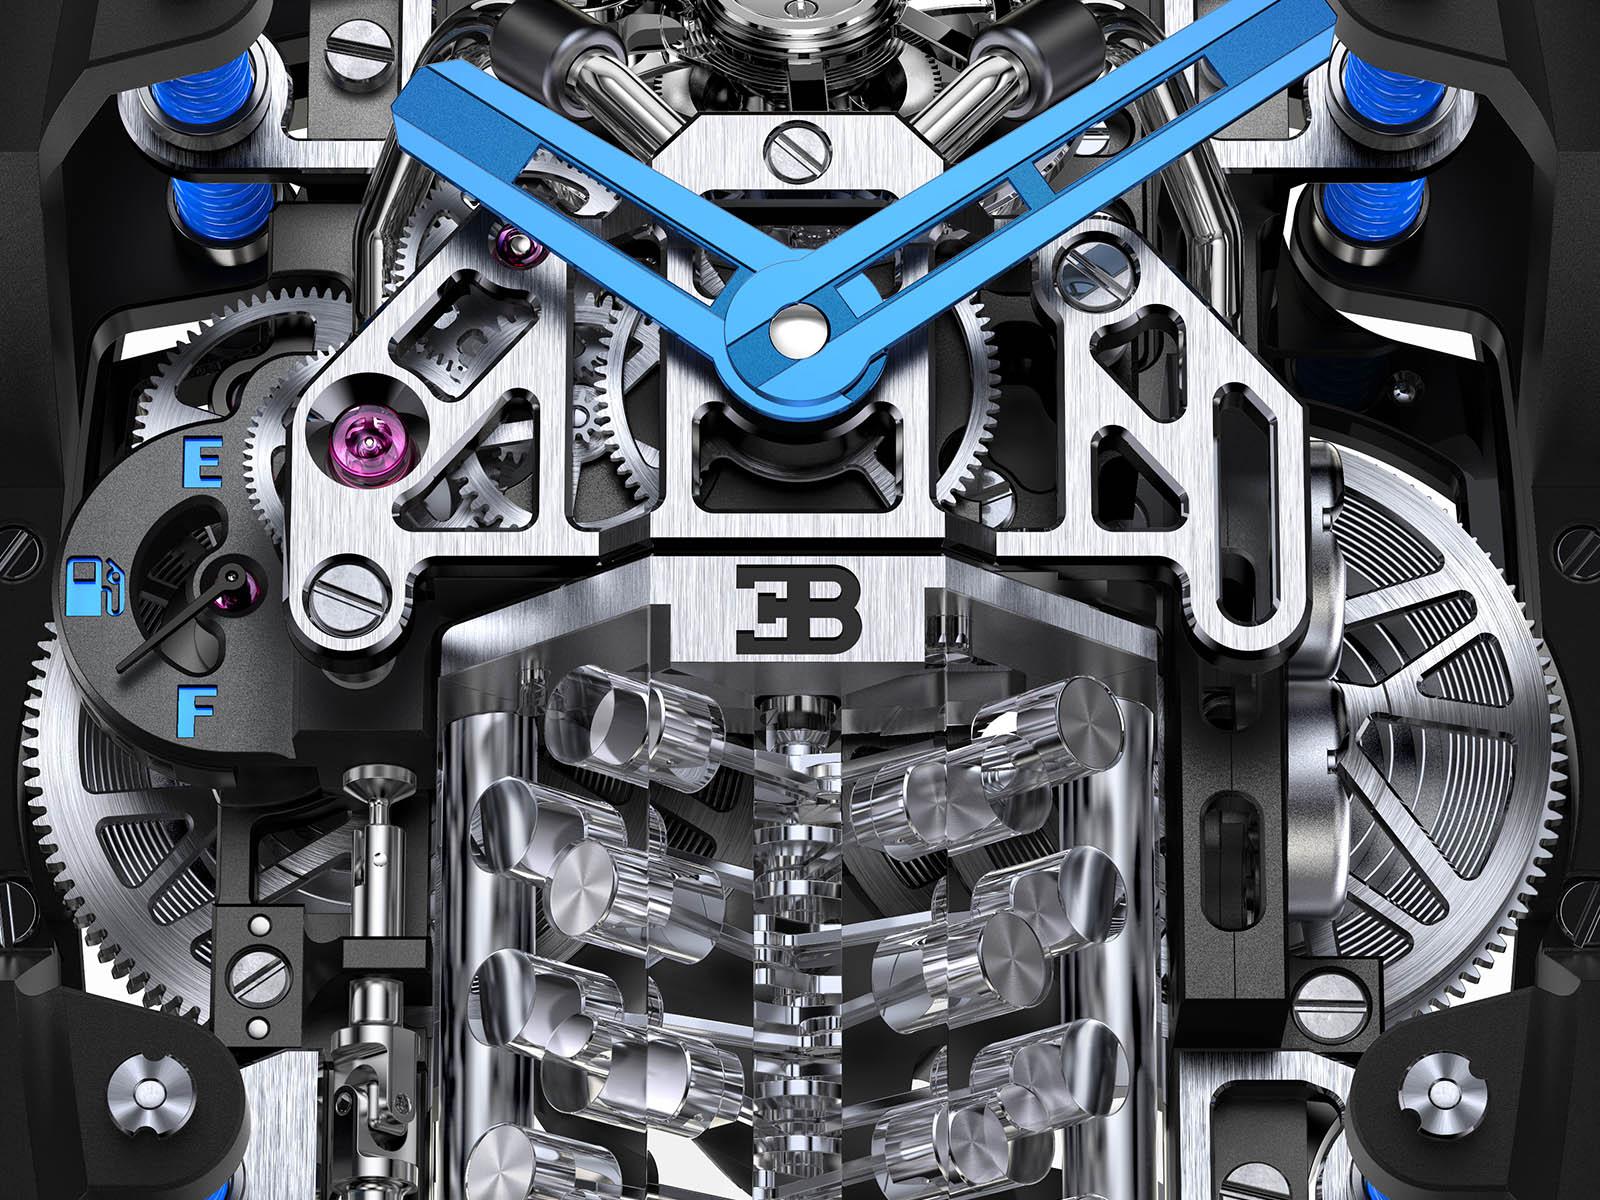 af321-40-ba-ad-absaa-jacob-co-bugatti-chiron-tourbillon-4.jpg